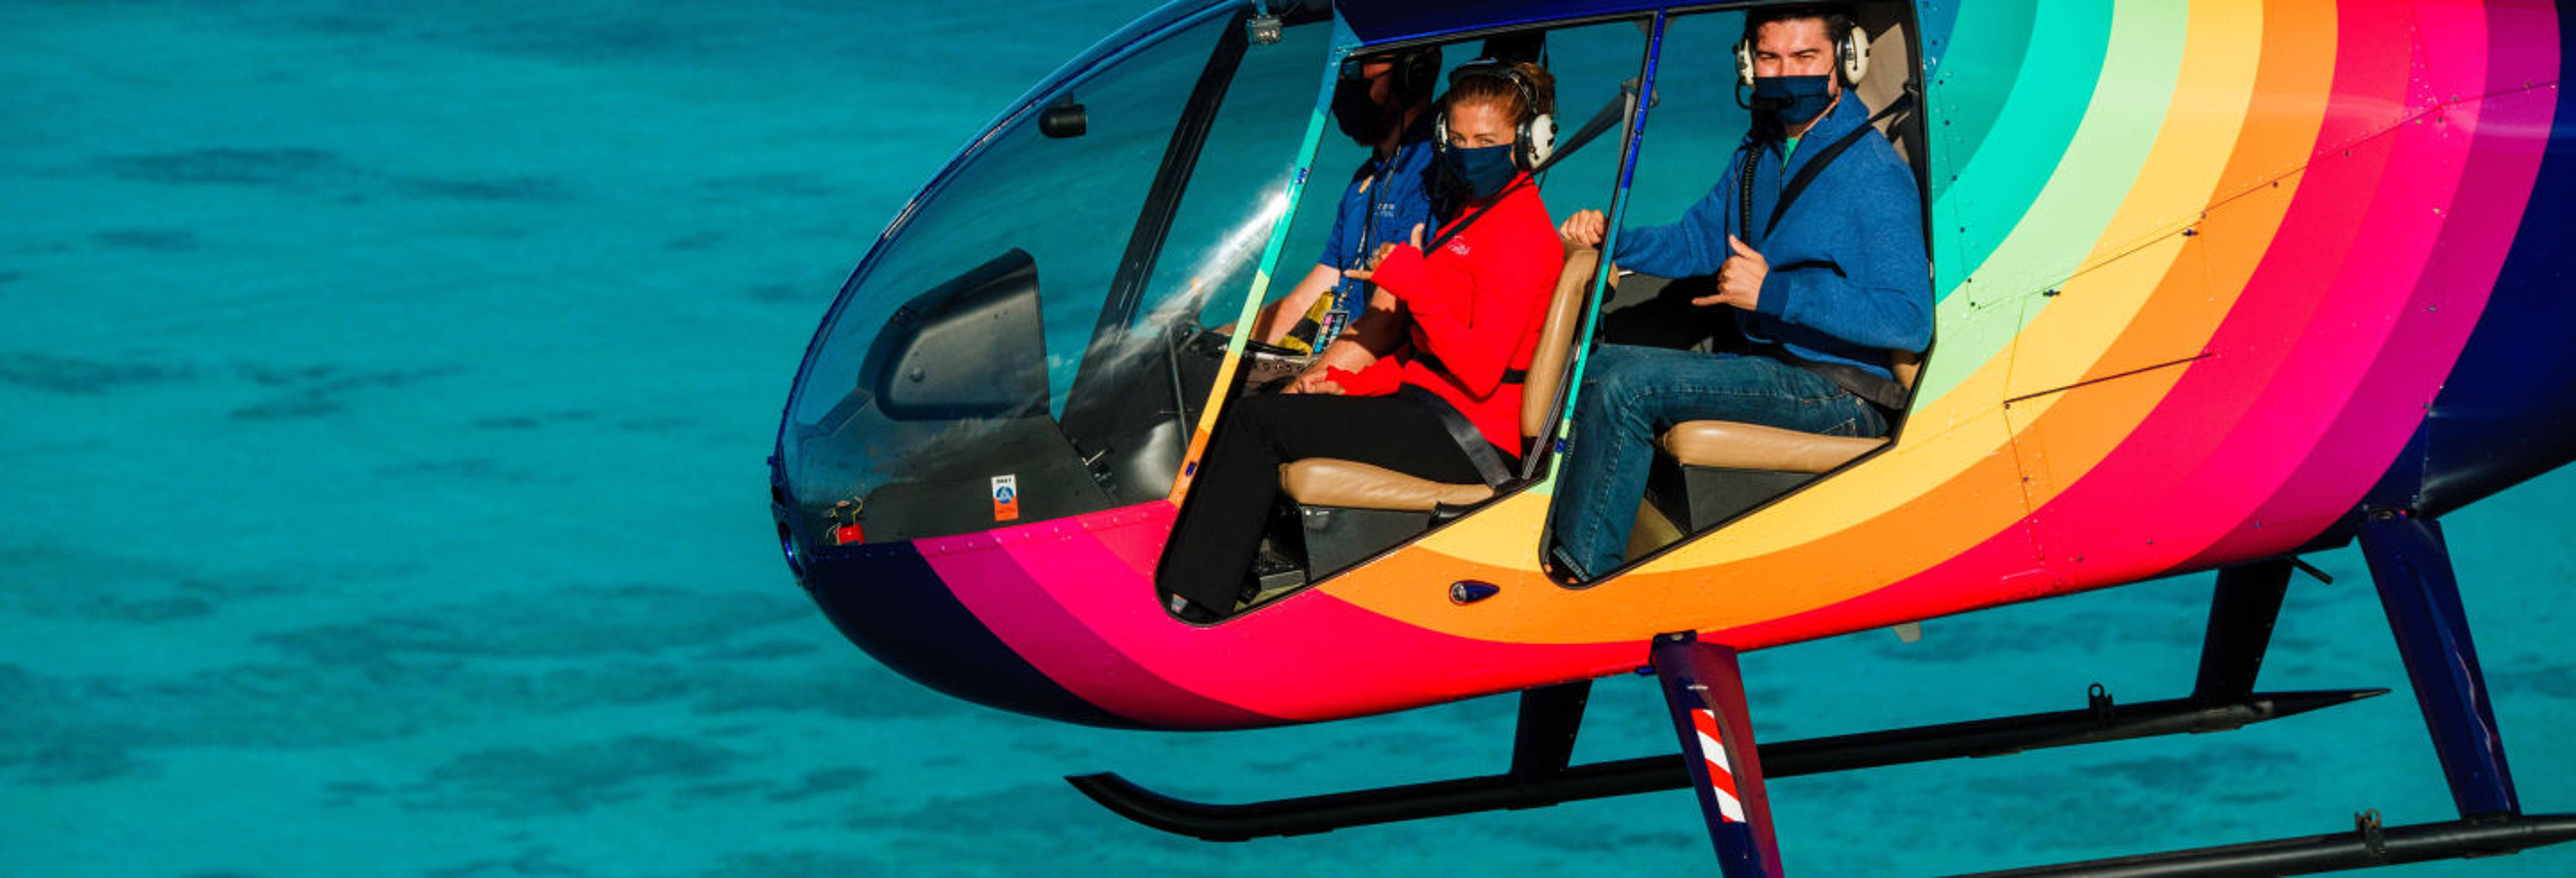 Paseo en helicóptero por Oahu